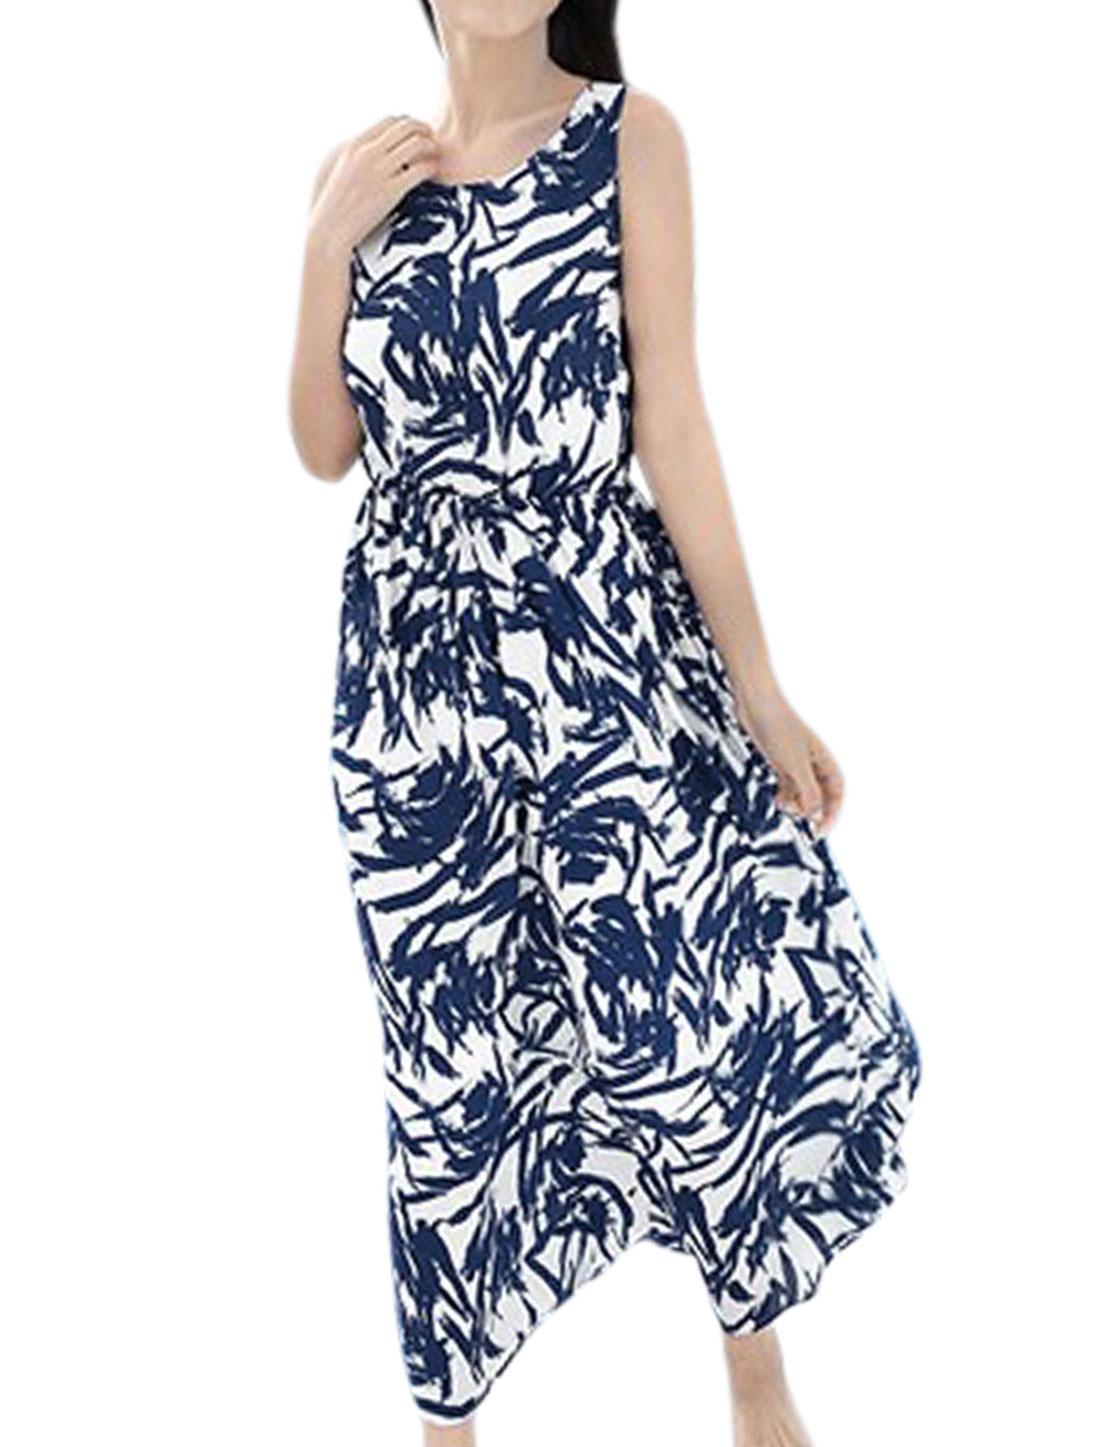 Lady's Sleeveless Elastic Waist Novelty Pattern Chiffon Long Dress Dark Blue M